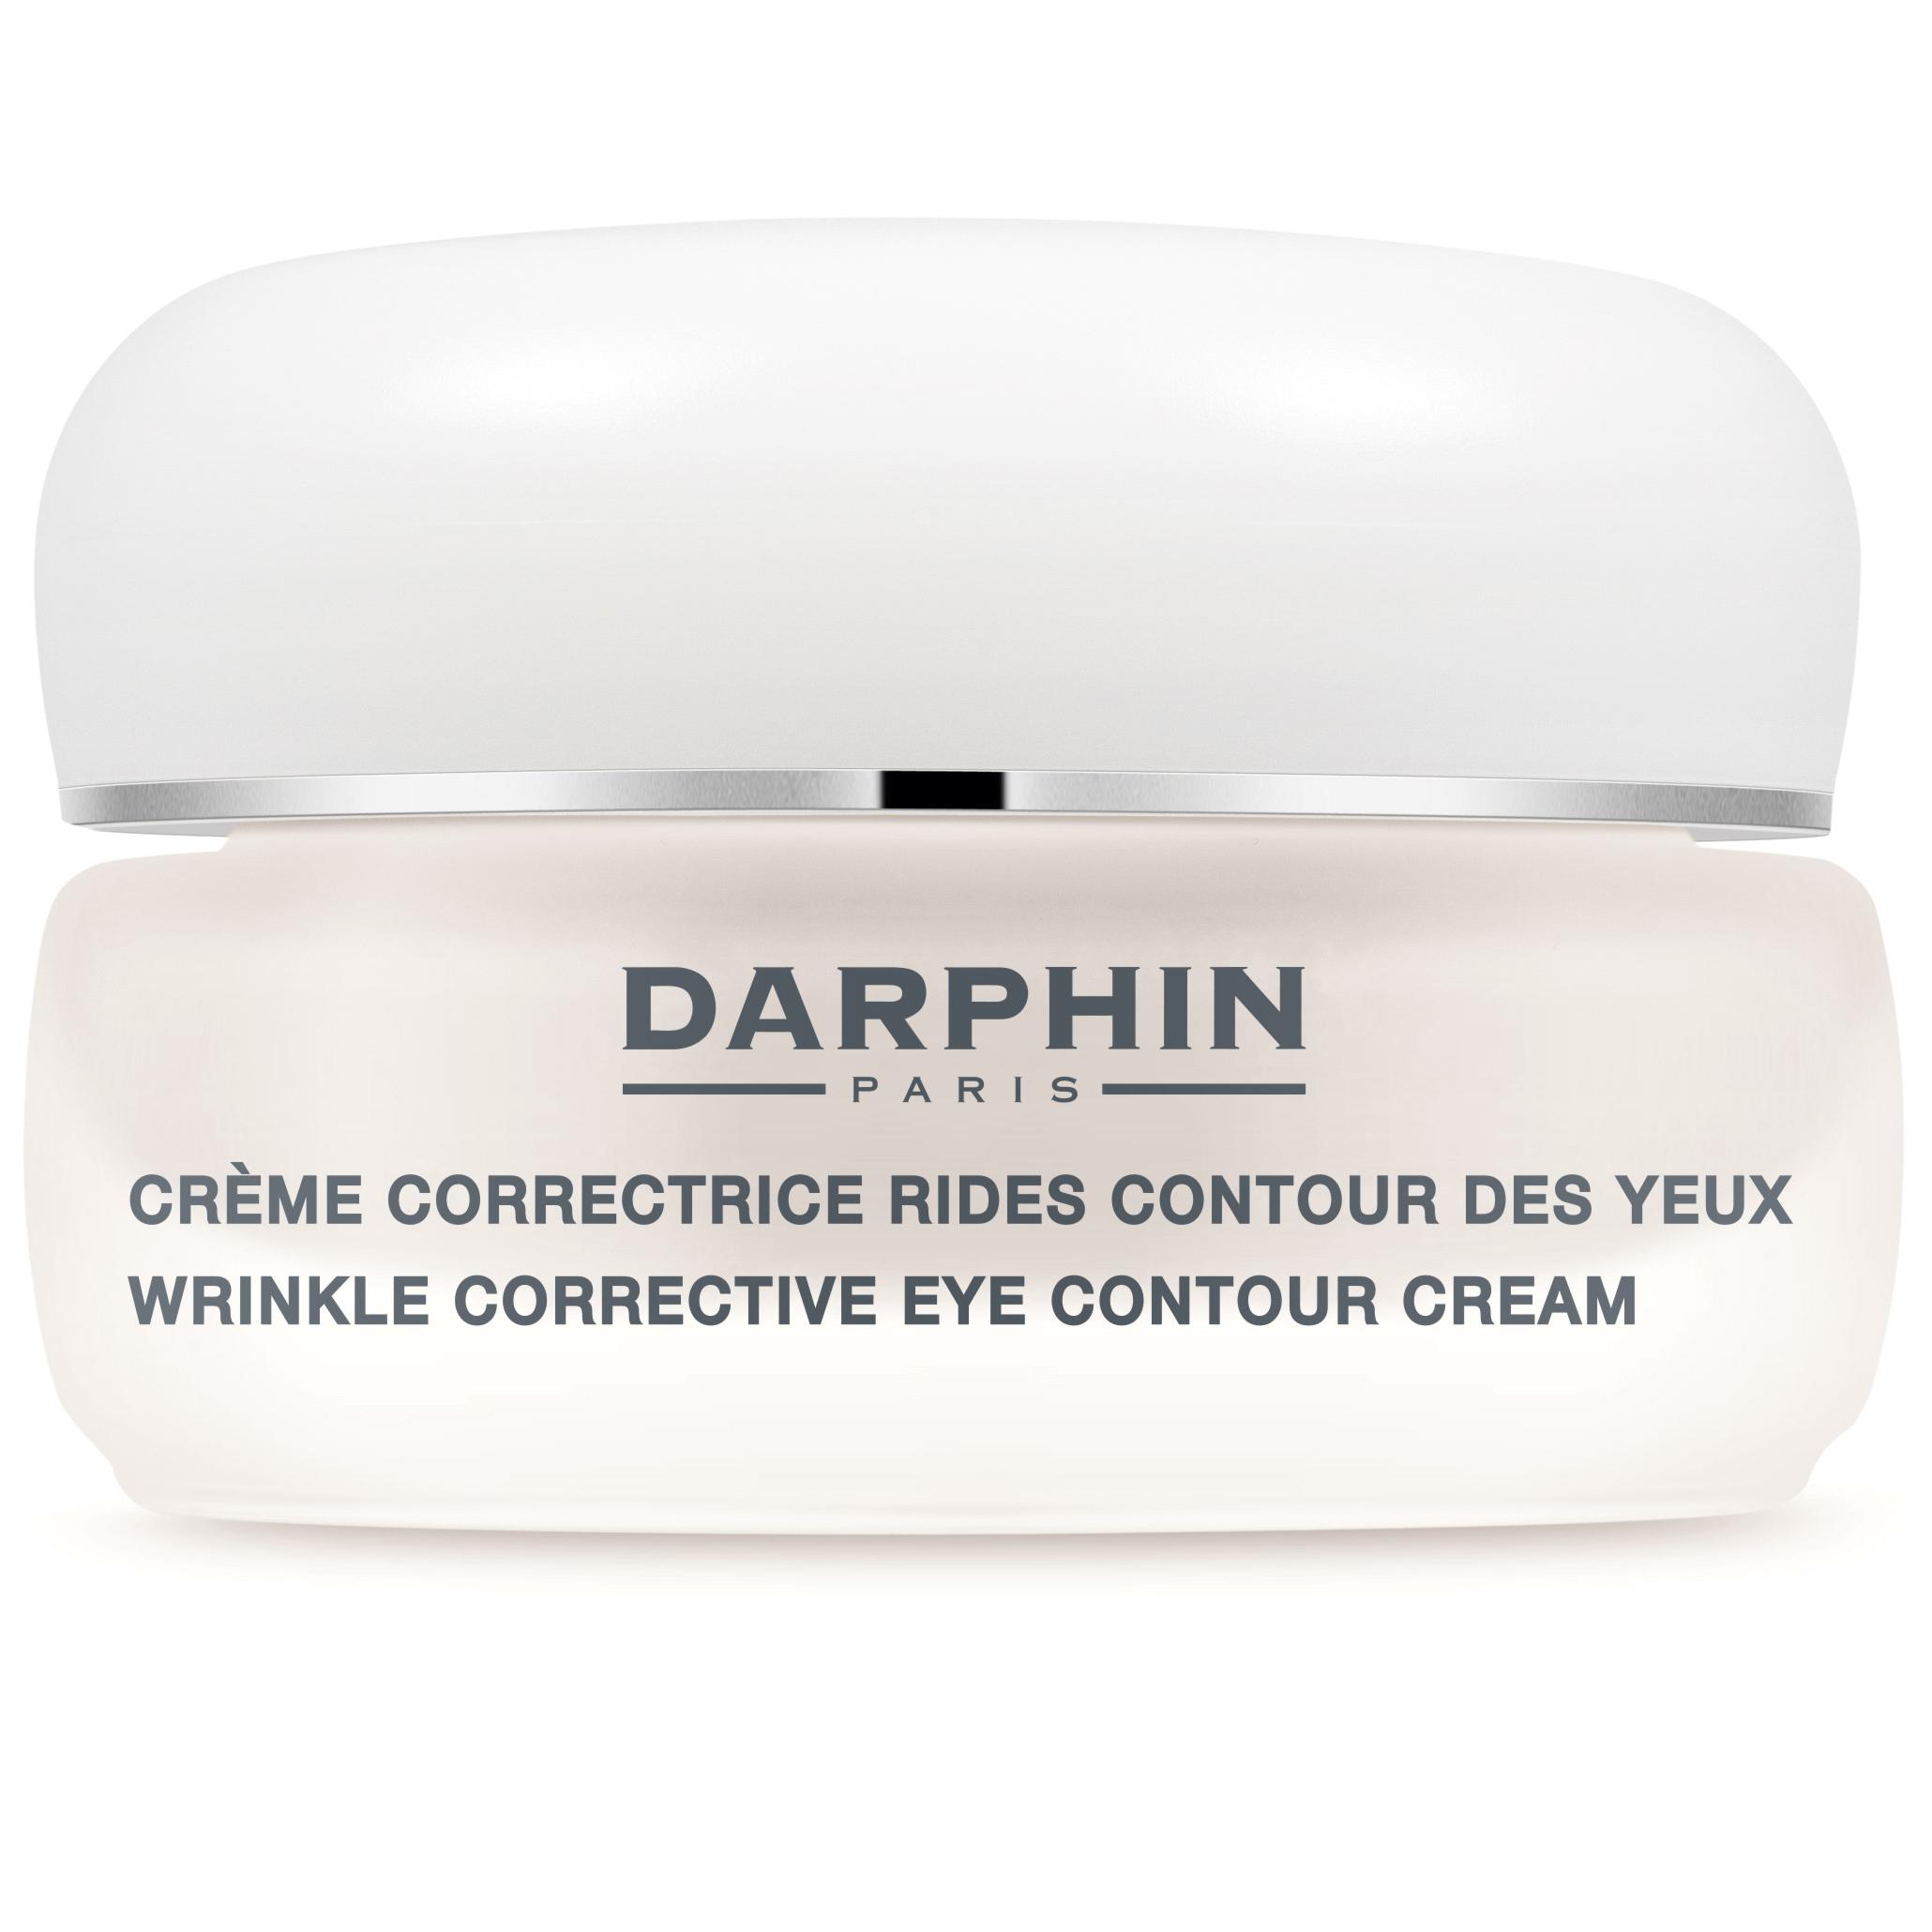 DARPHIN Wrinkle Corrective Eye Contour Cream Αντιγηραντική Κρέμα Ματιών 15ml